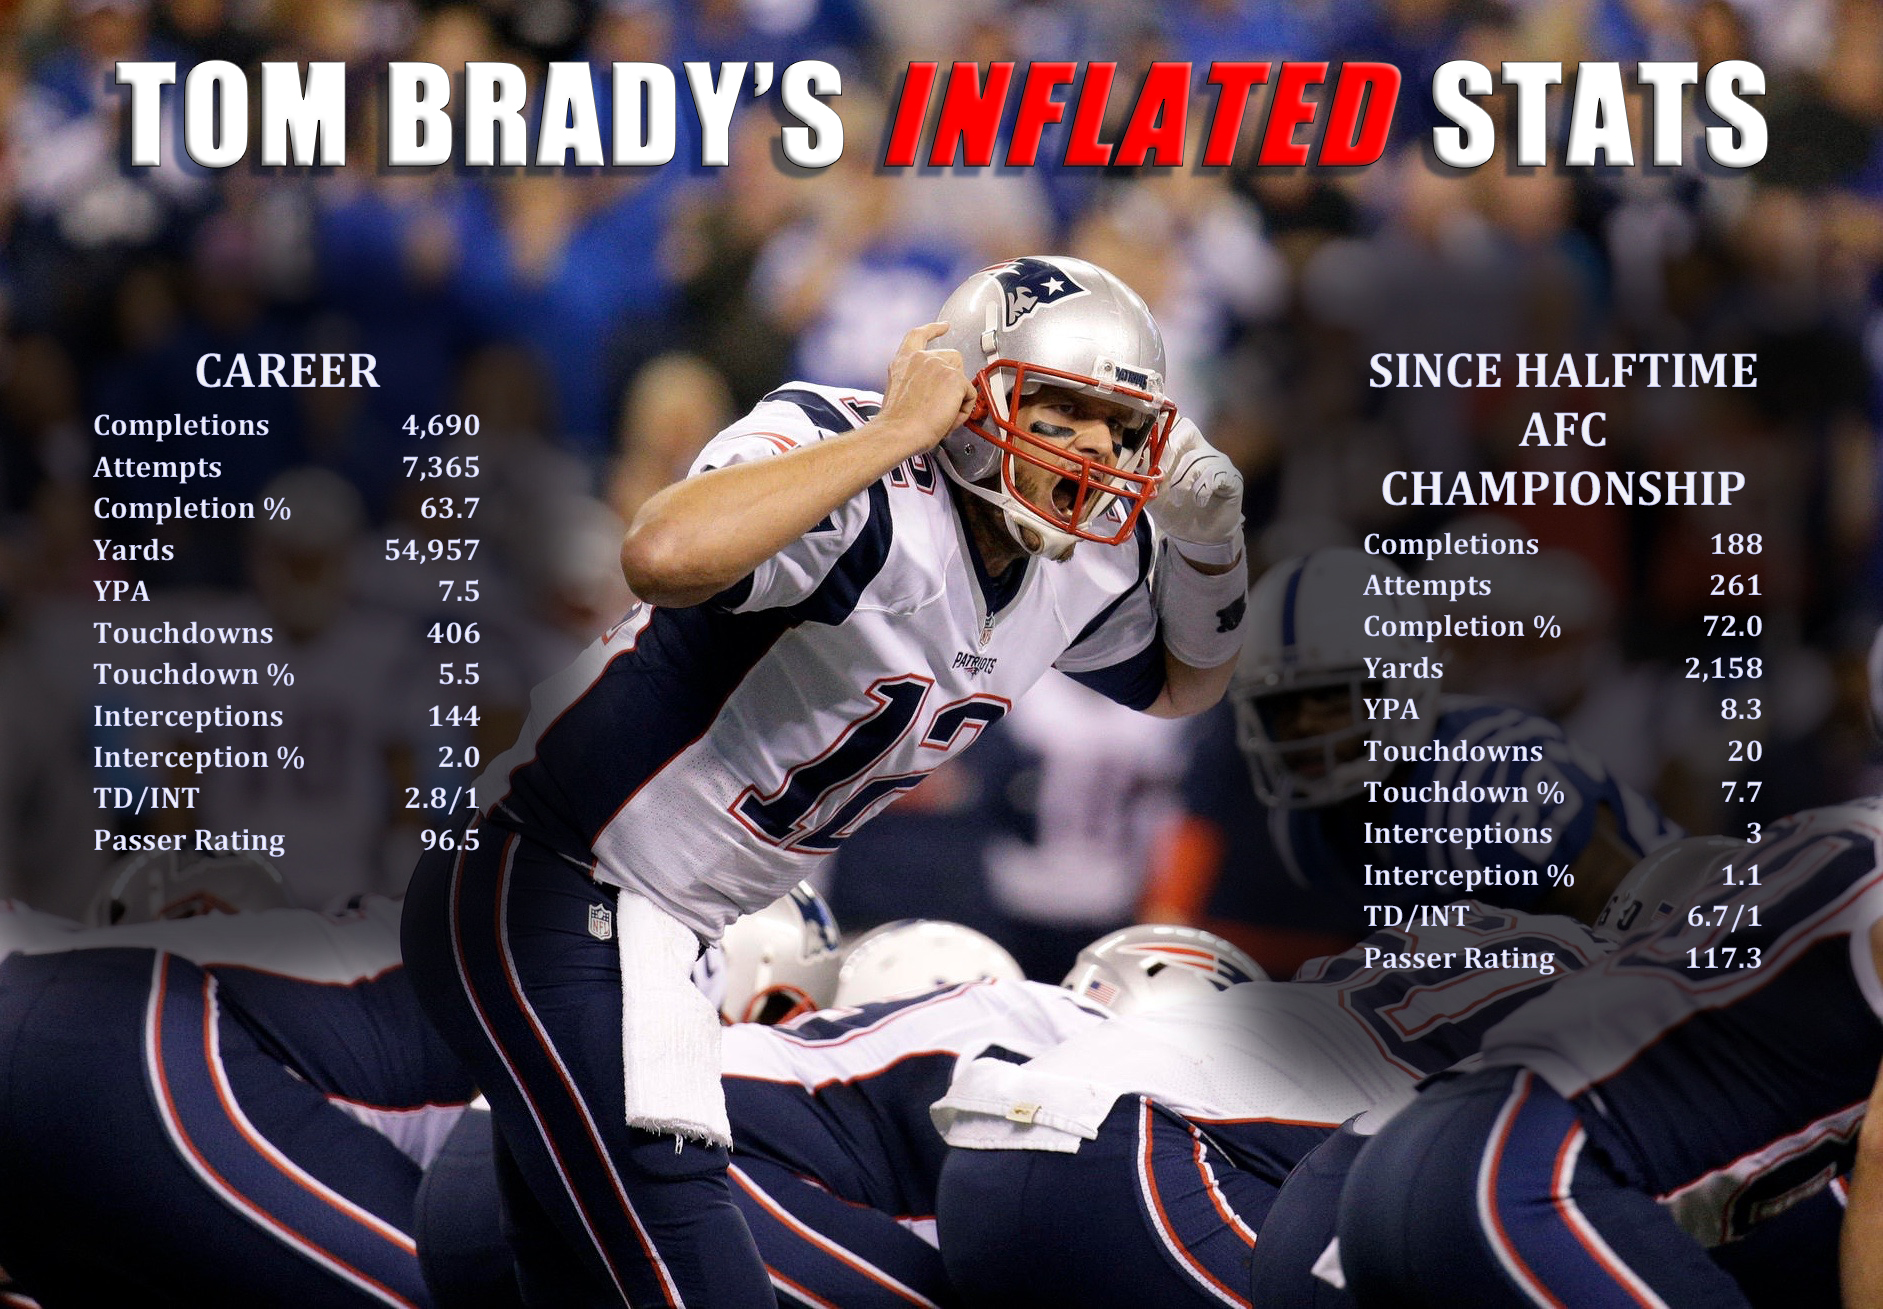 BradysInflatedStatsgame5